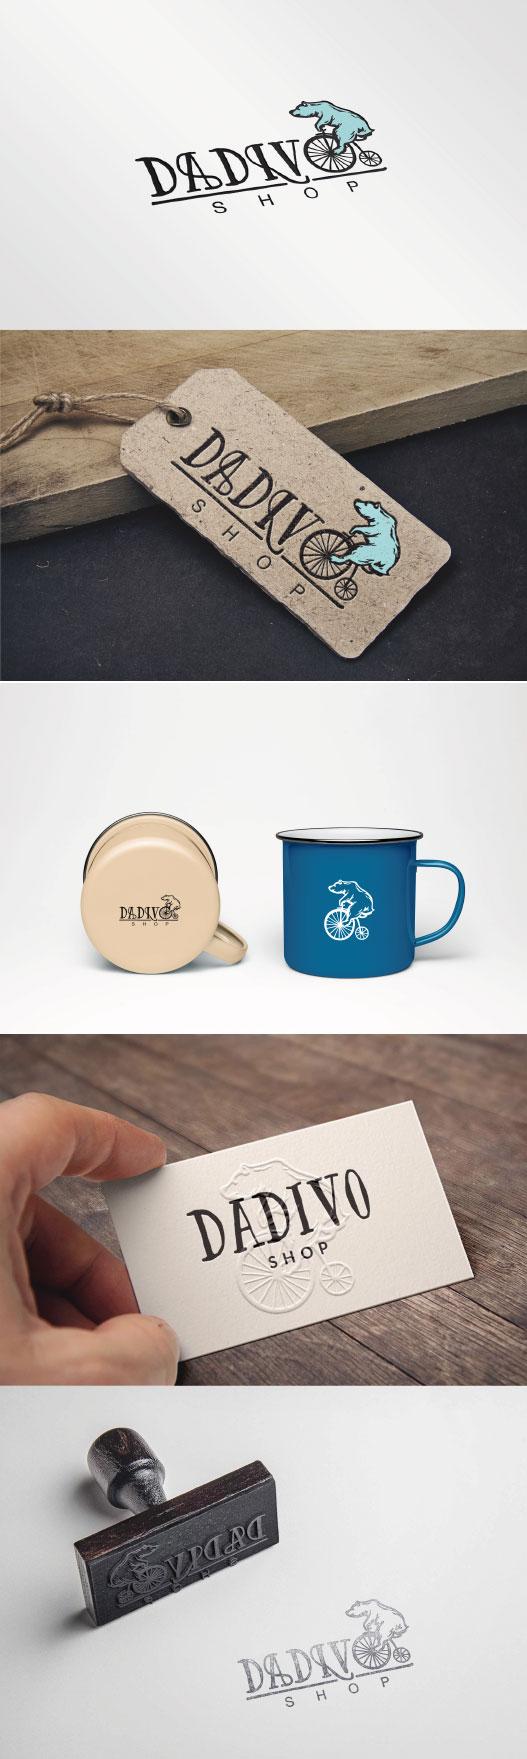 #logotipo #diseñográfico #branding #imagengráfica